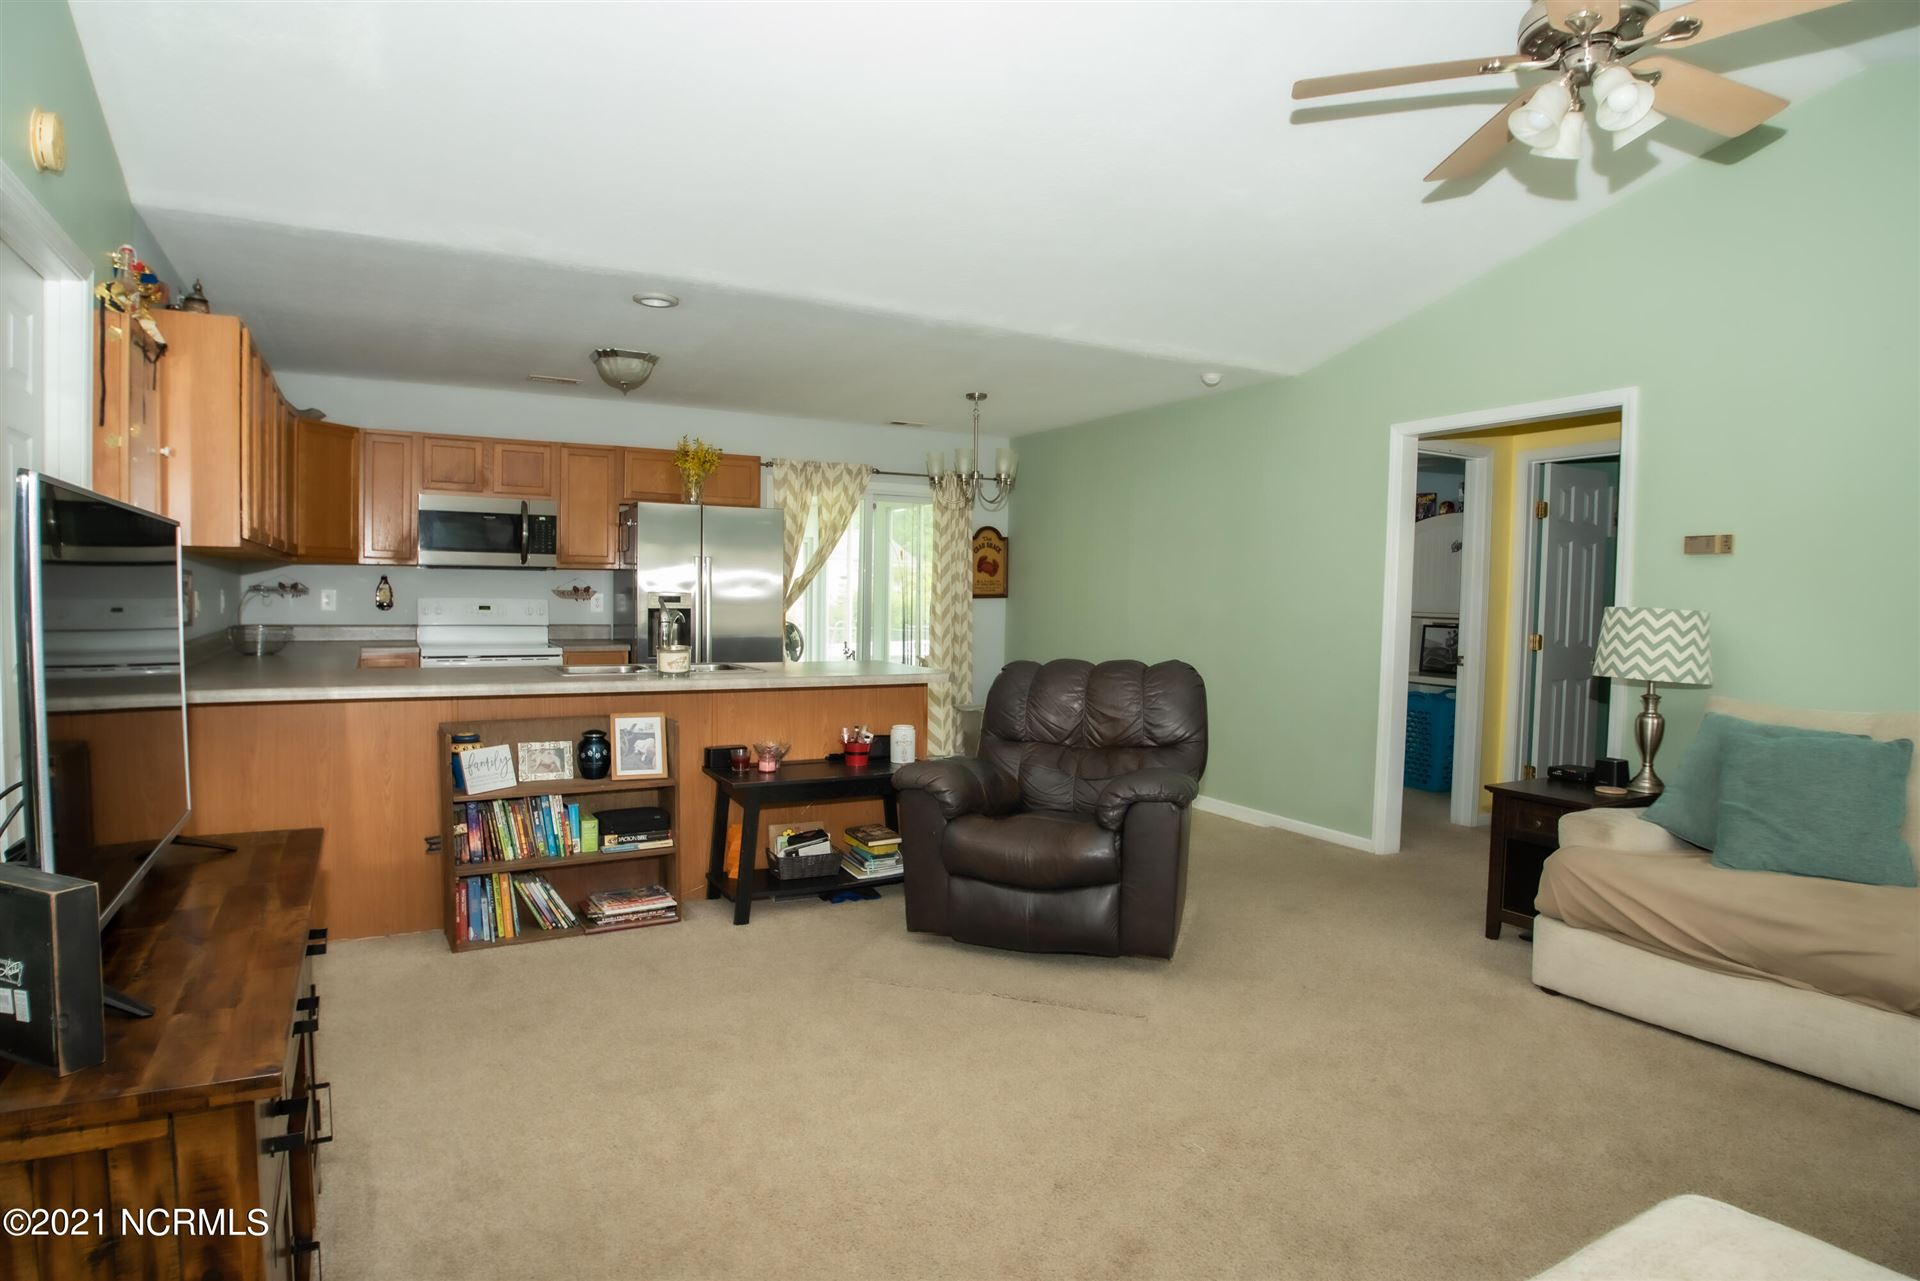 Photo of 126 Sweet Bay Drive, New Bern, NC 28560 (MLS # 100290410)